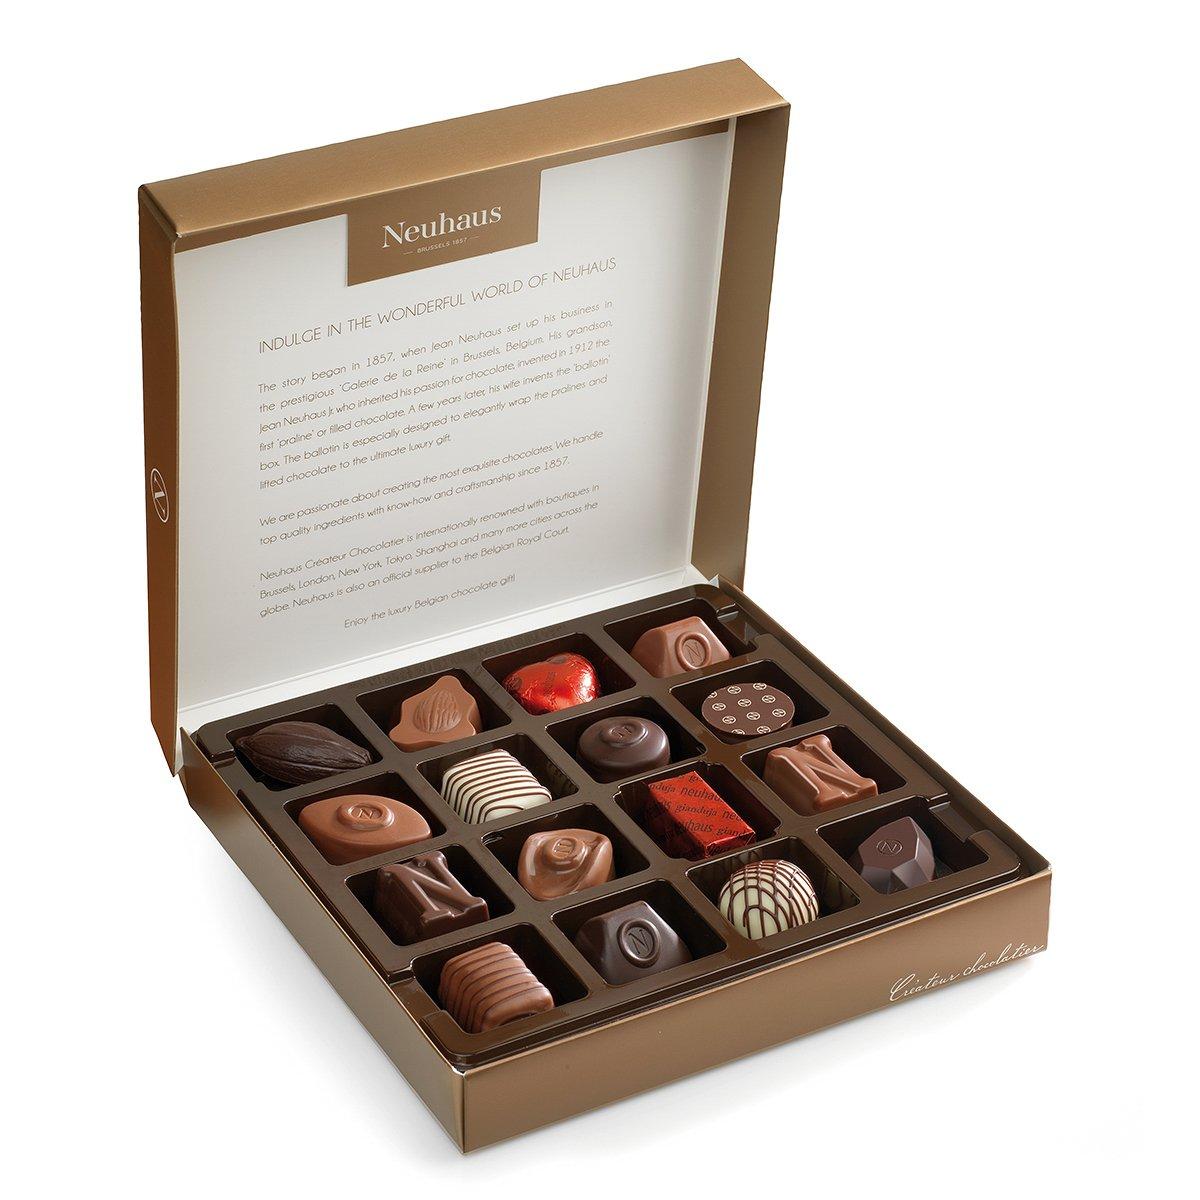 Amazon.com : Neuhaus Chocolate Bronze Collection : Grocery ...